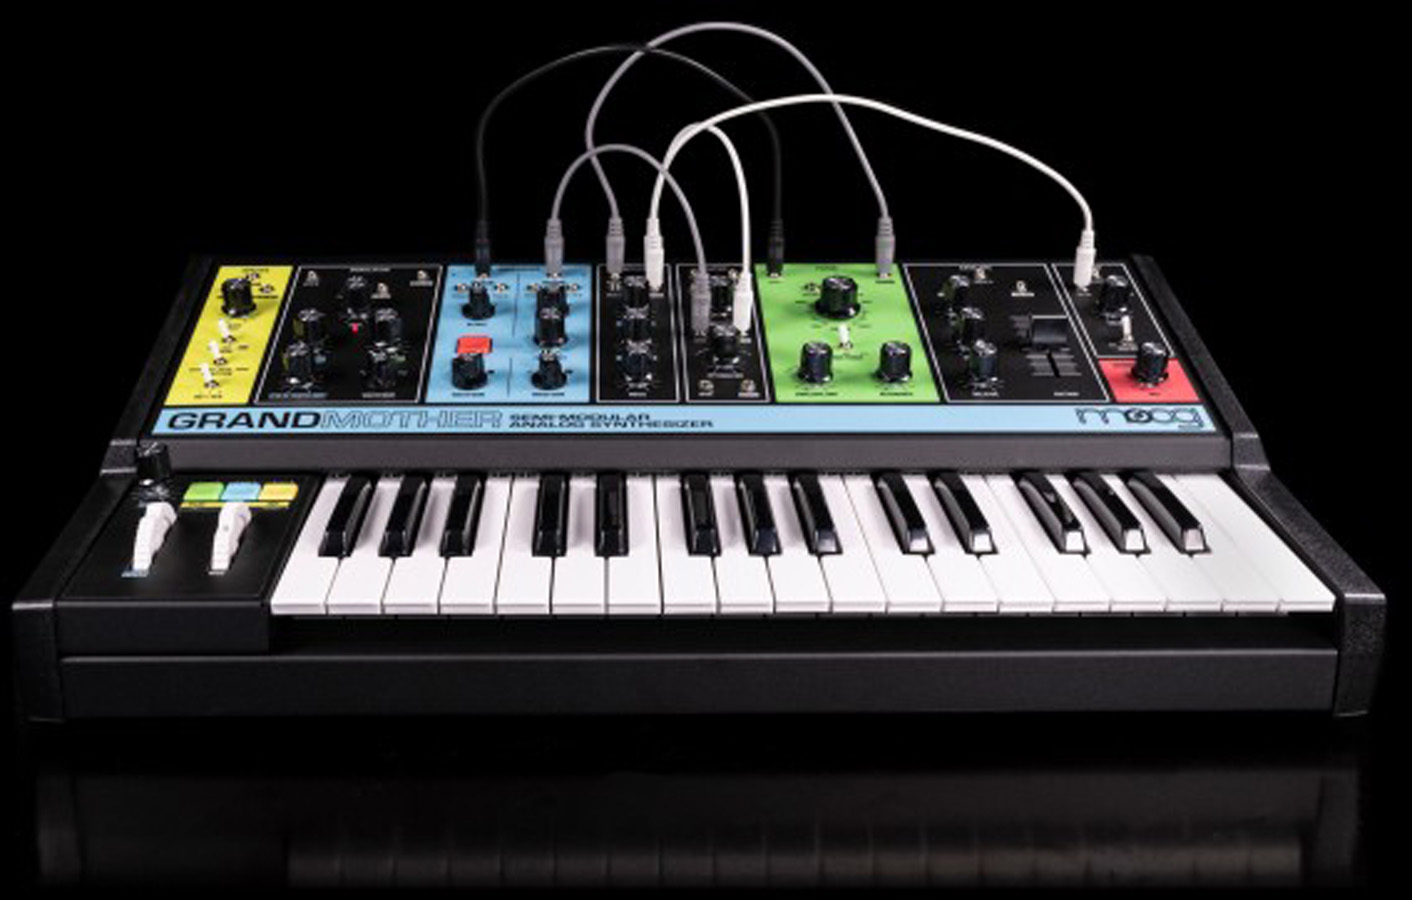 Moog Grandmother semi Modular Synth